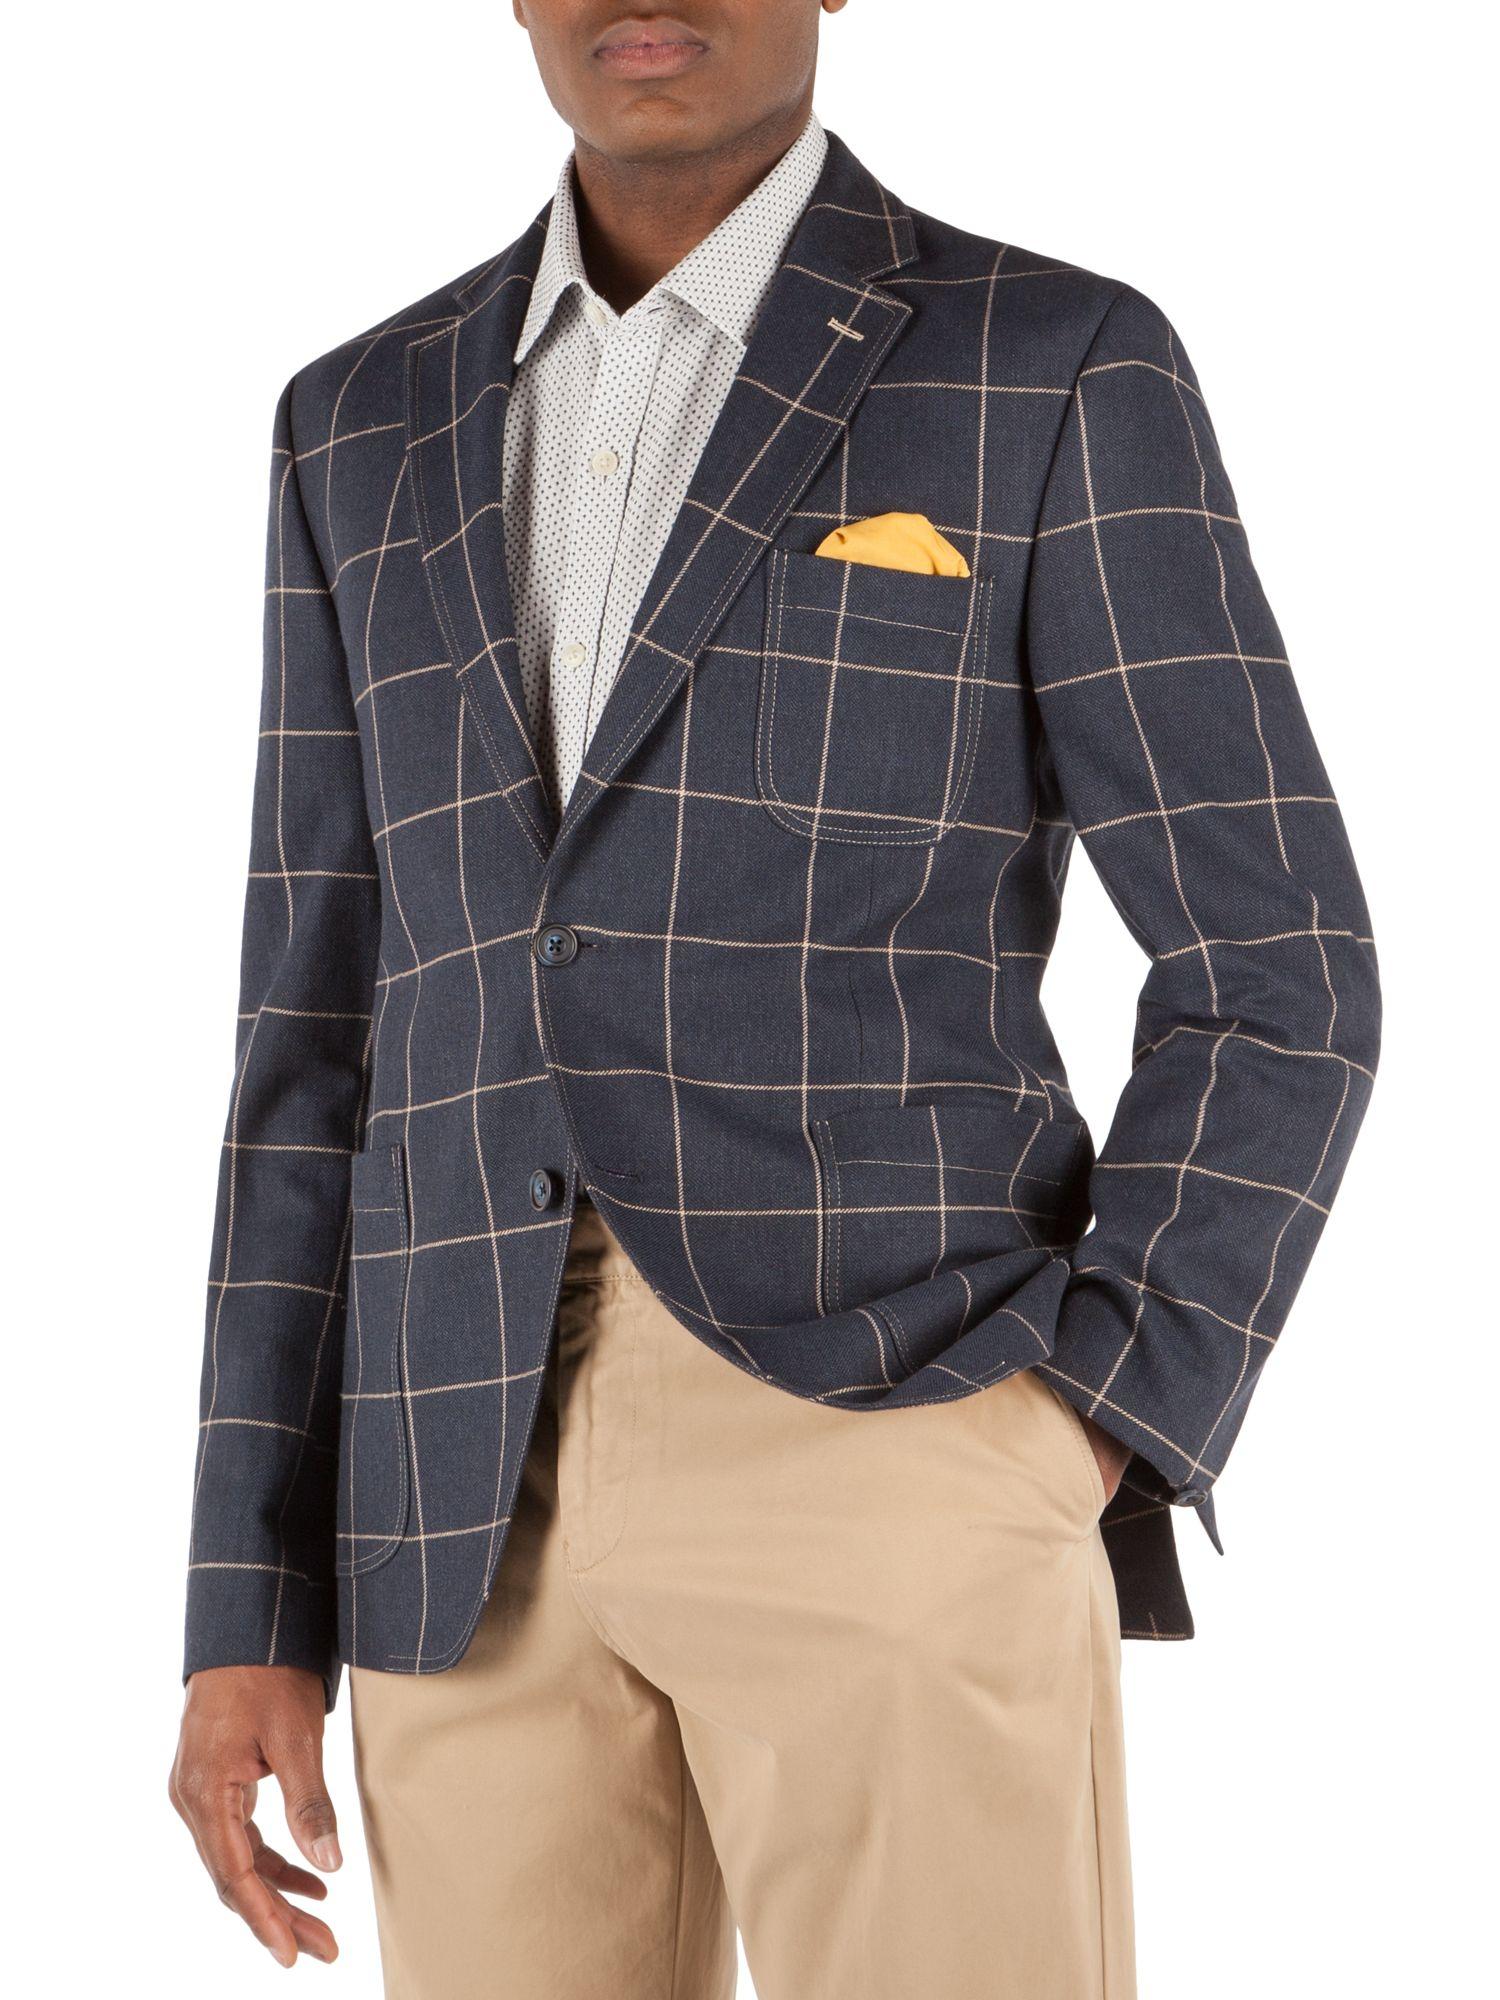 Blue Check Blazer Mens - Hazard Golf Clothing